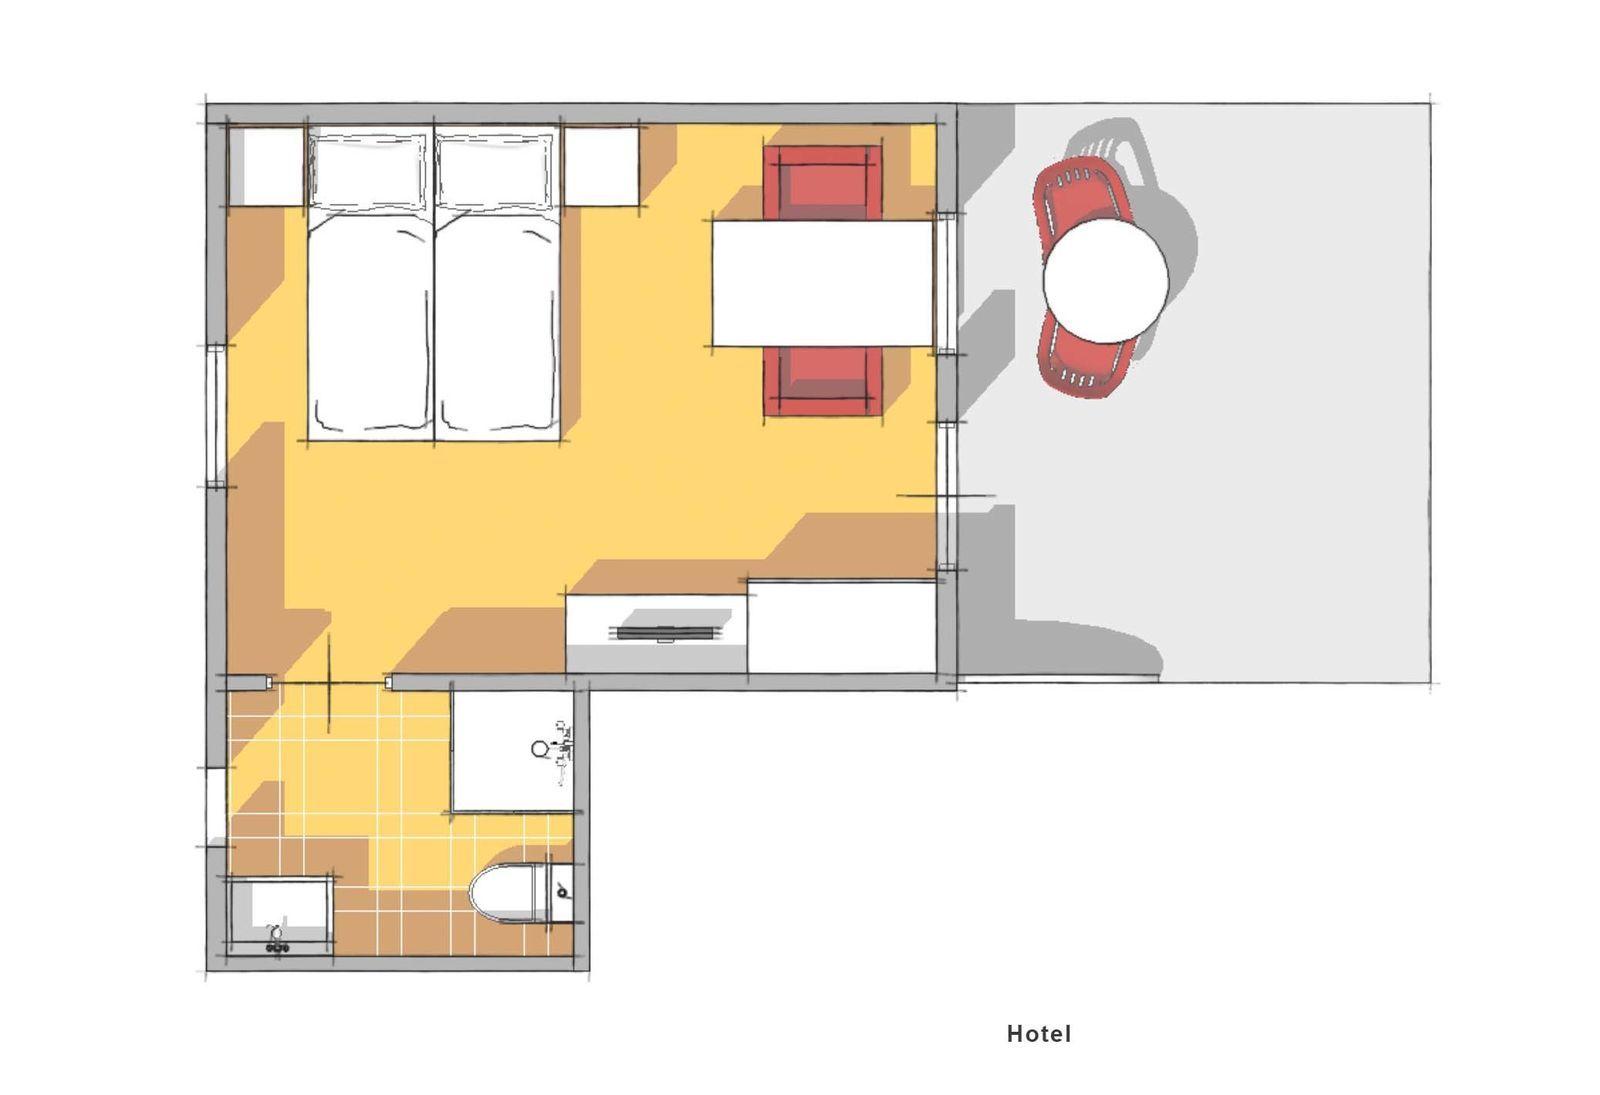 2-person Hotelroom